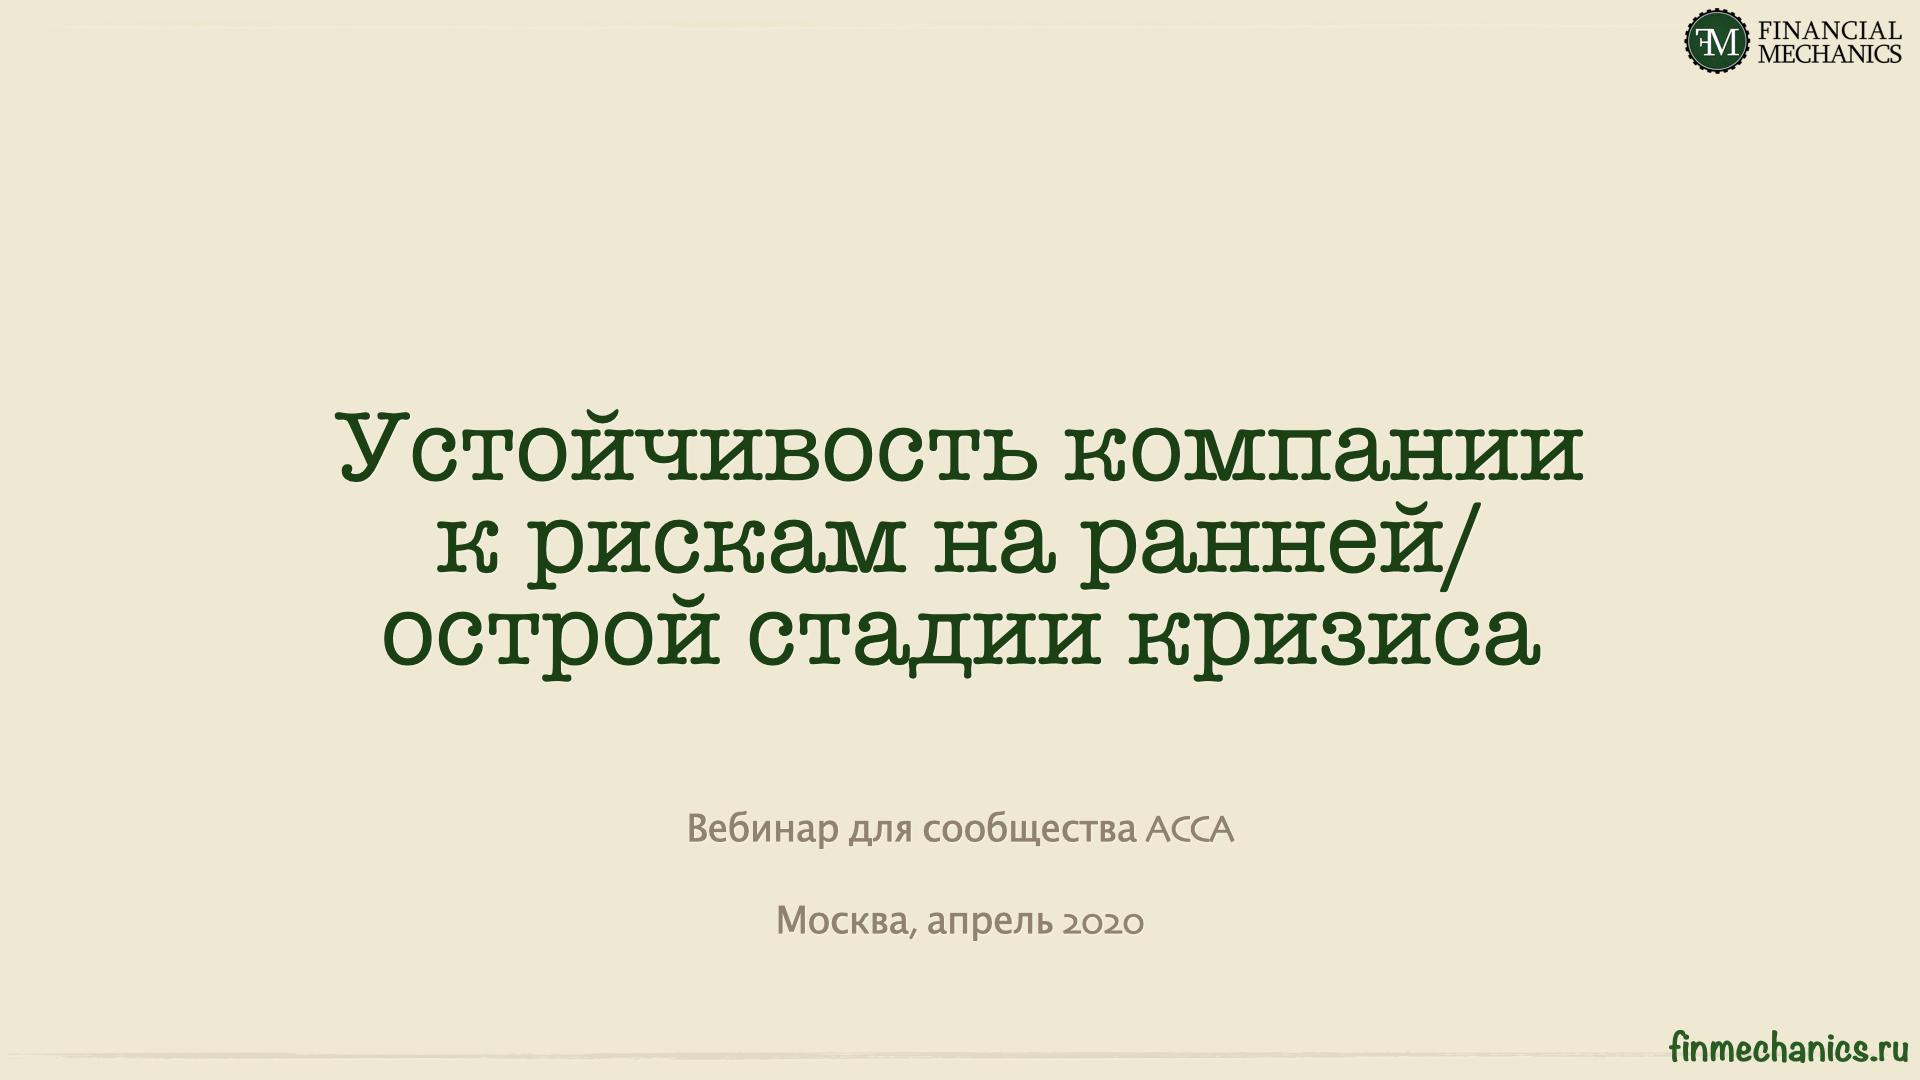 ACCA_2020_07_04_V2.001